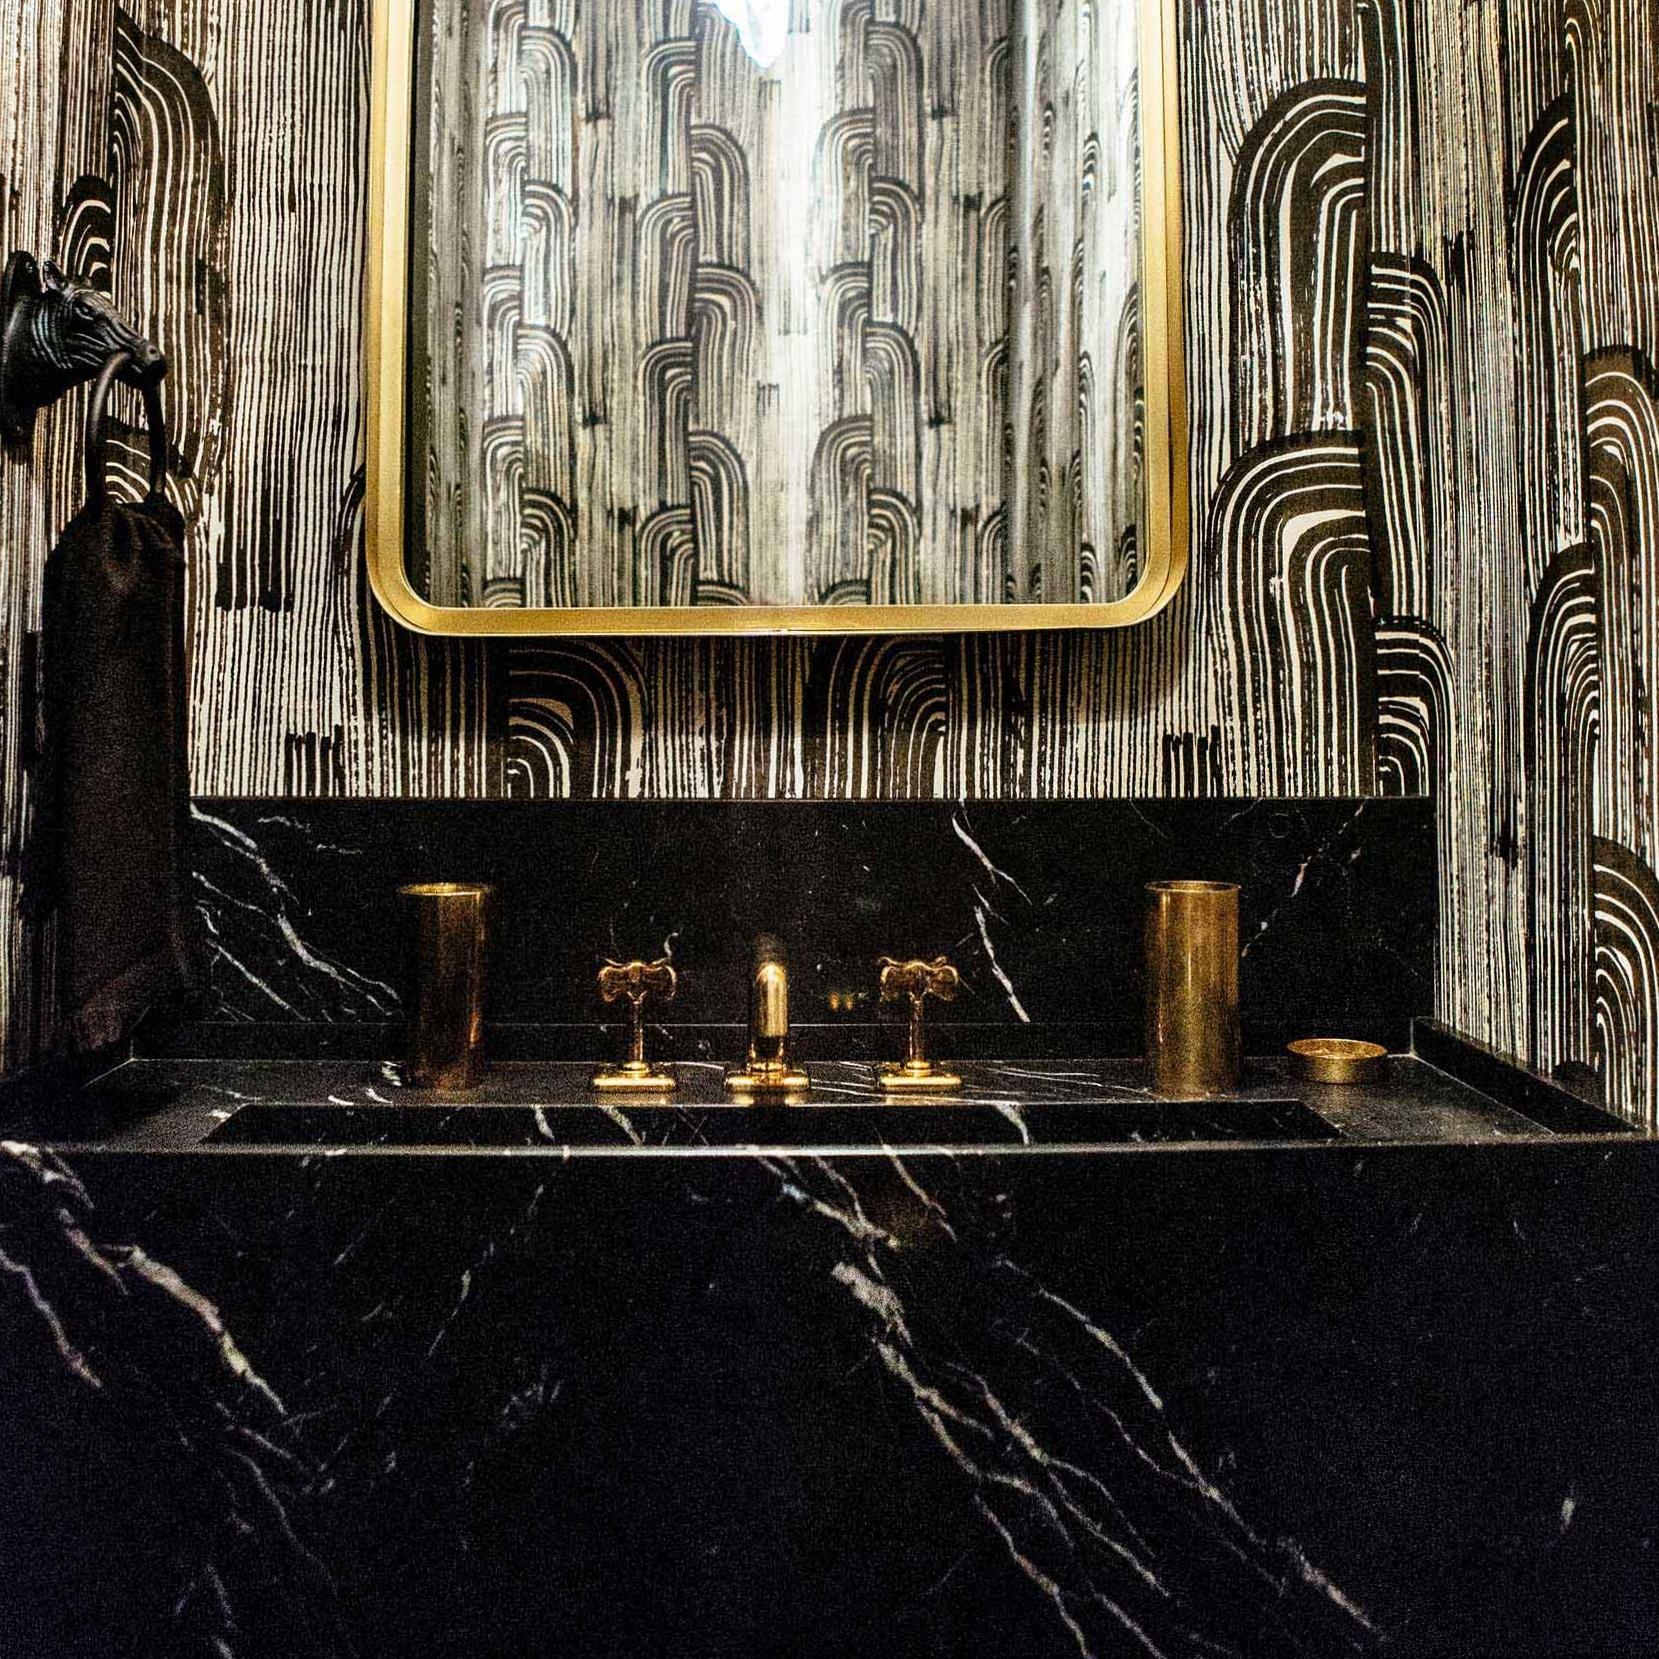 Leo_Designs_Chicago_interior_lake_shore_renovation23.jpg